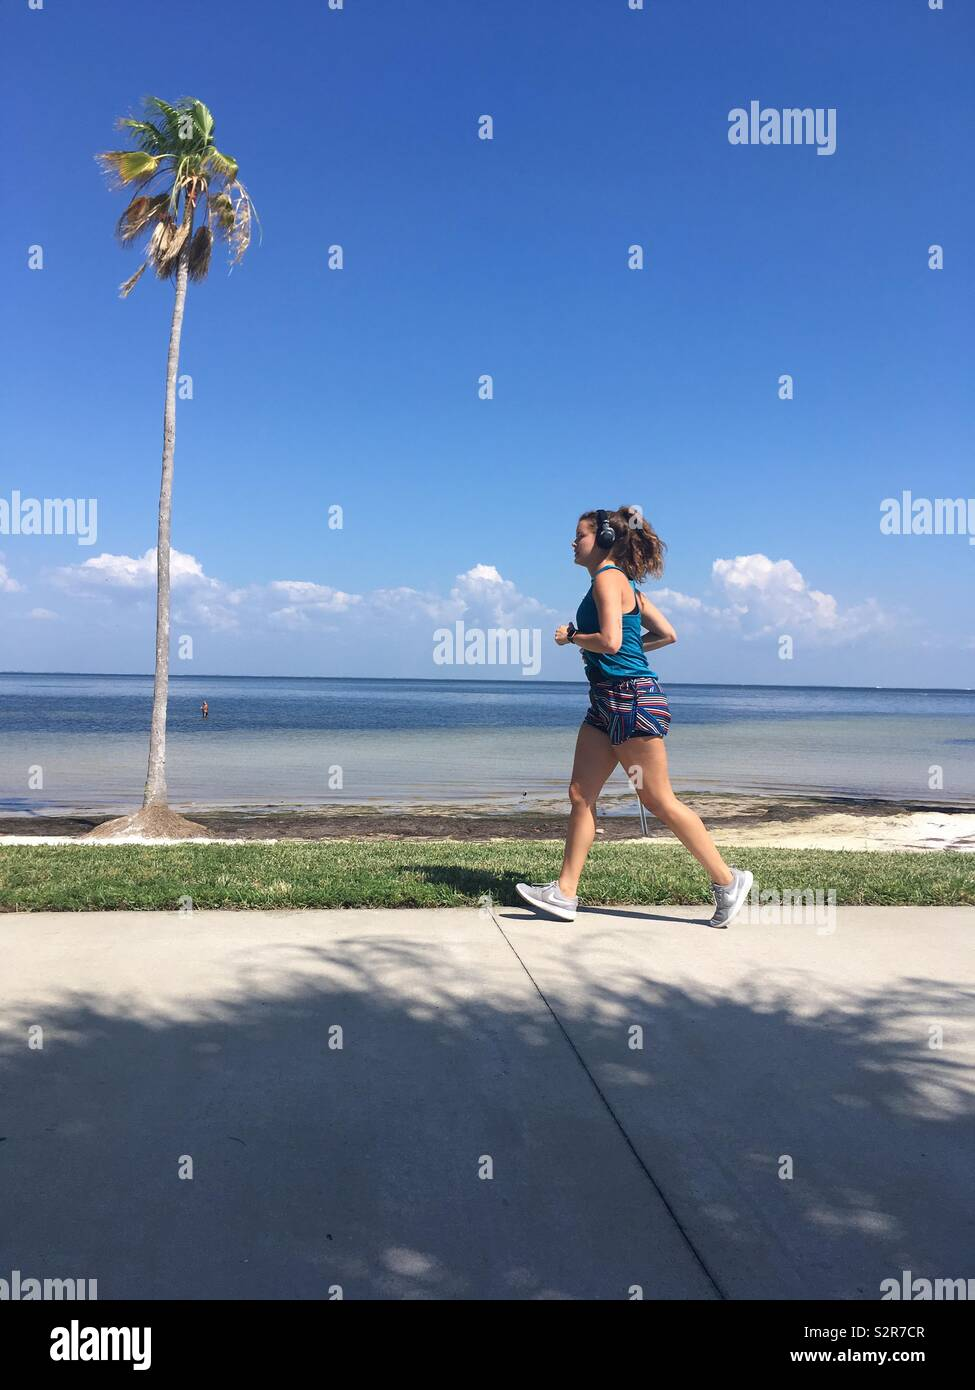 Woman running past palm tree - Stock Image